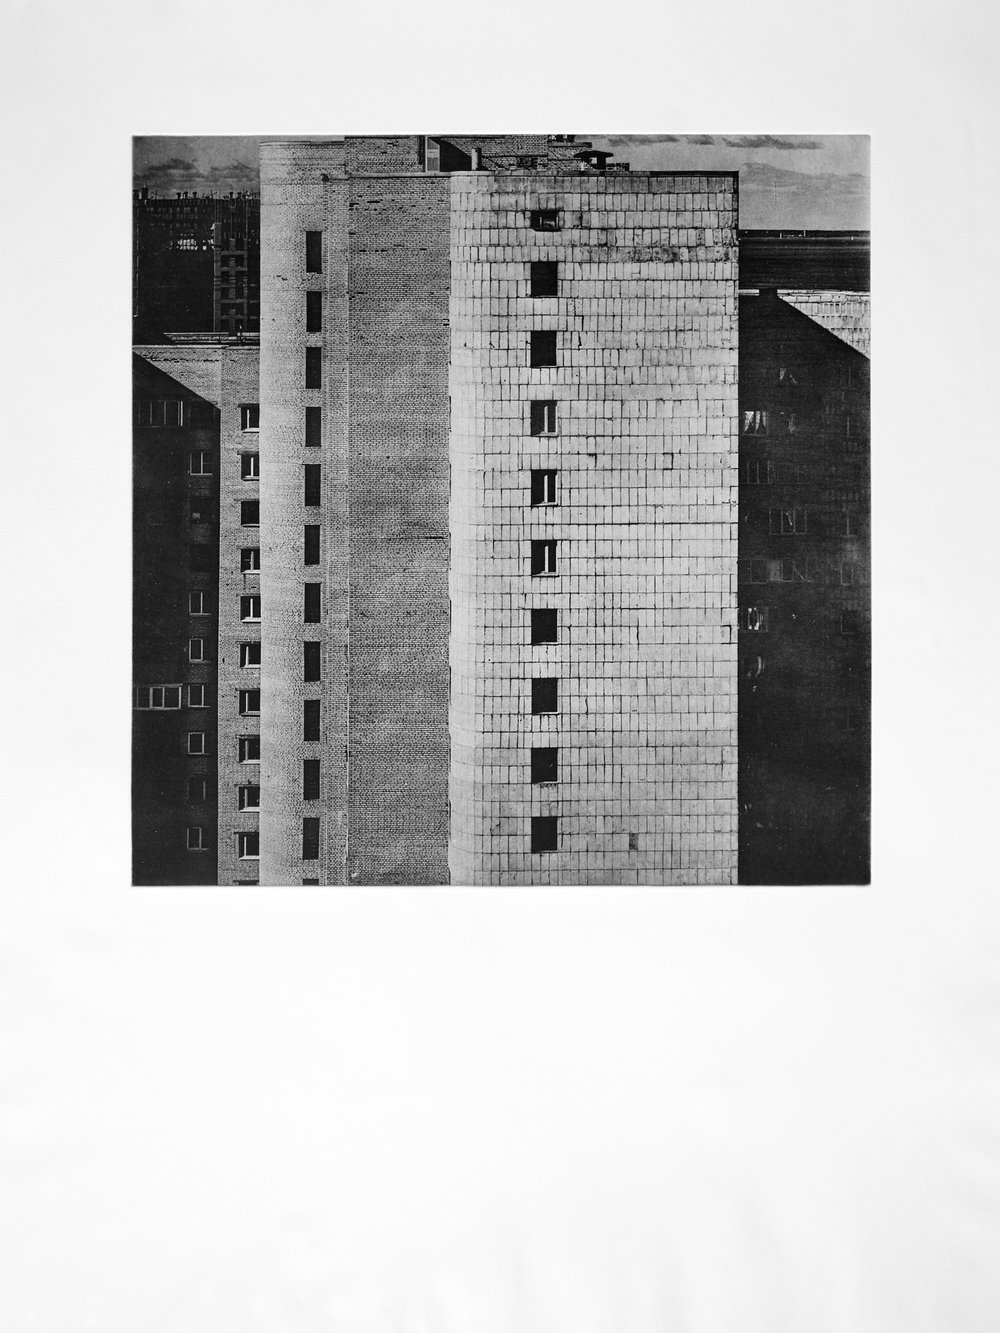 Der Bau i (2017)  medium: Heliogravüre  size: 60 x 80 cm  paper: Zerkall 270 g/qm  plate: 44 x 44 cm  edition: 11 copies  numbered: 1/7 - 7/7, 4 e.a.  printer: FWU